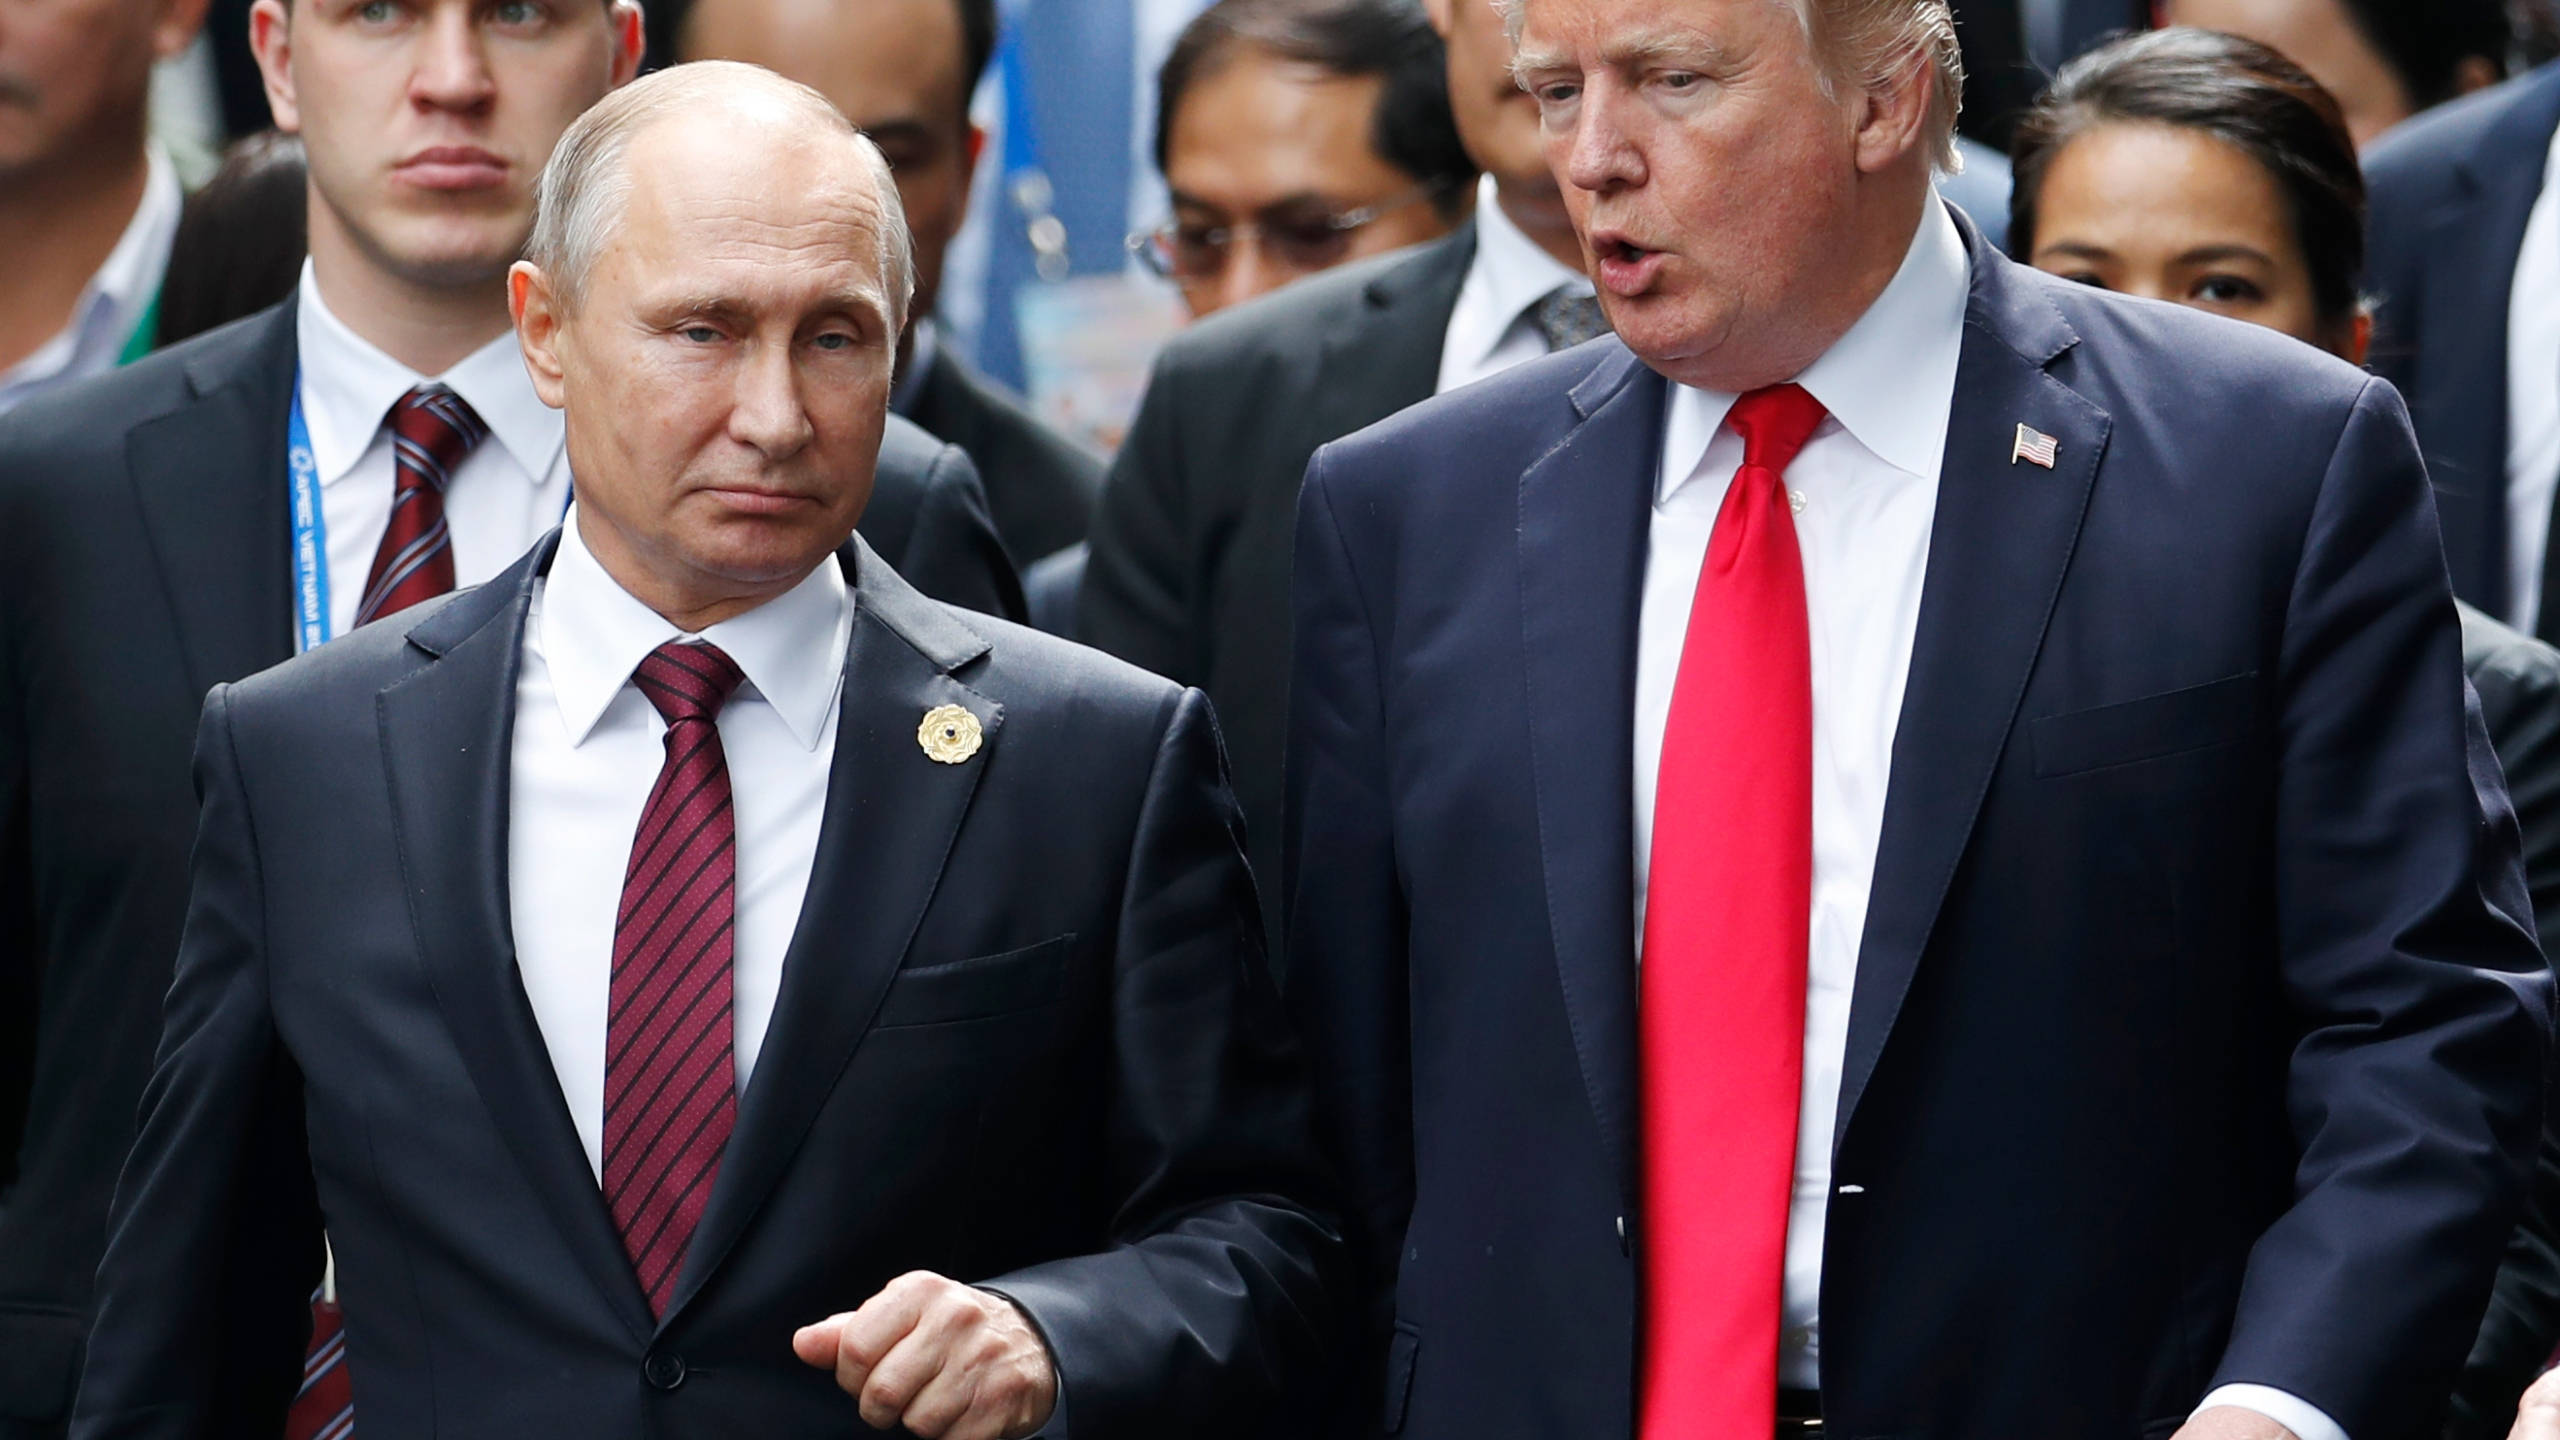 Trump-Putin-What_They_Want_70482-159532.jpg28293647